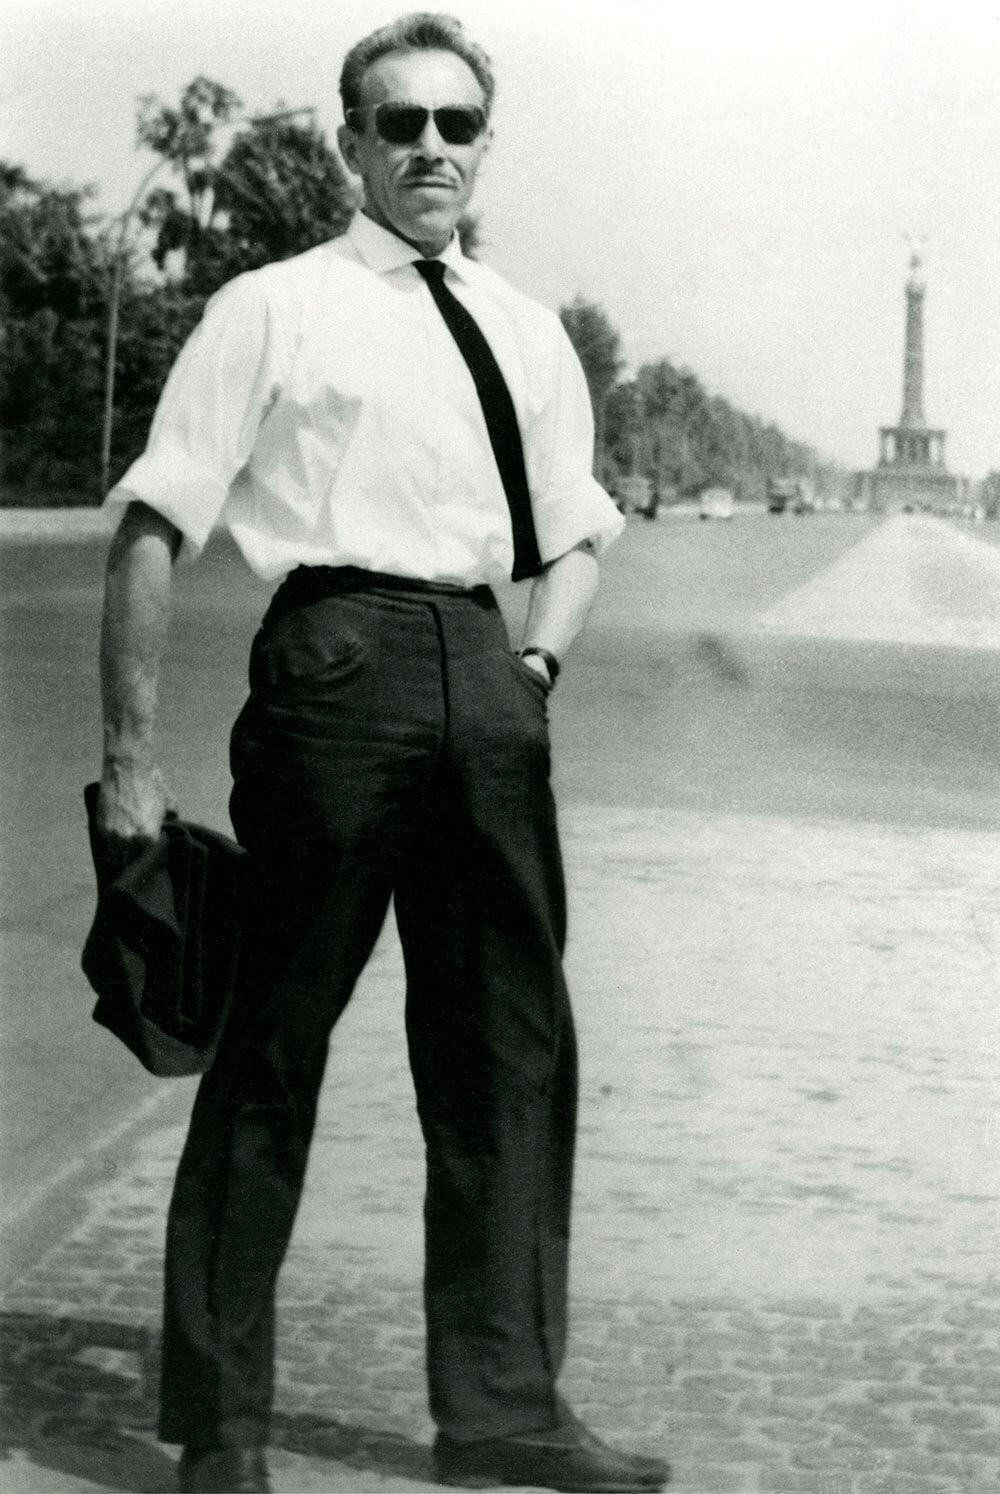 Tom of Finland in Berlin